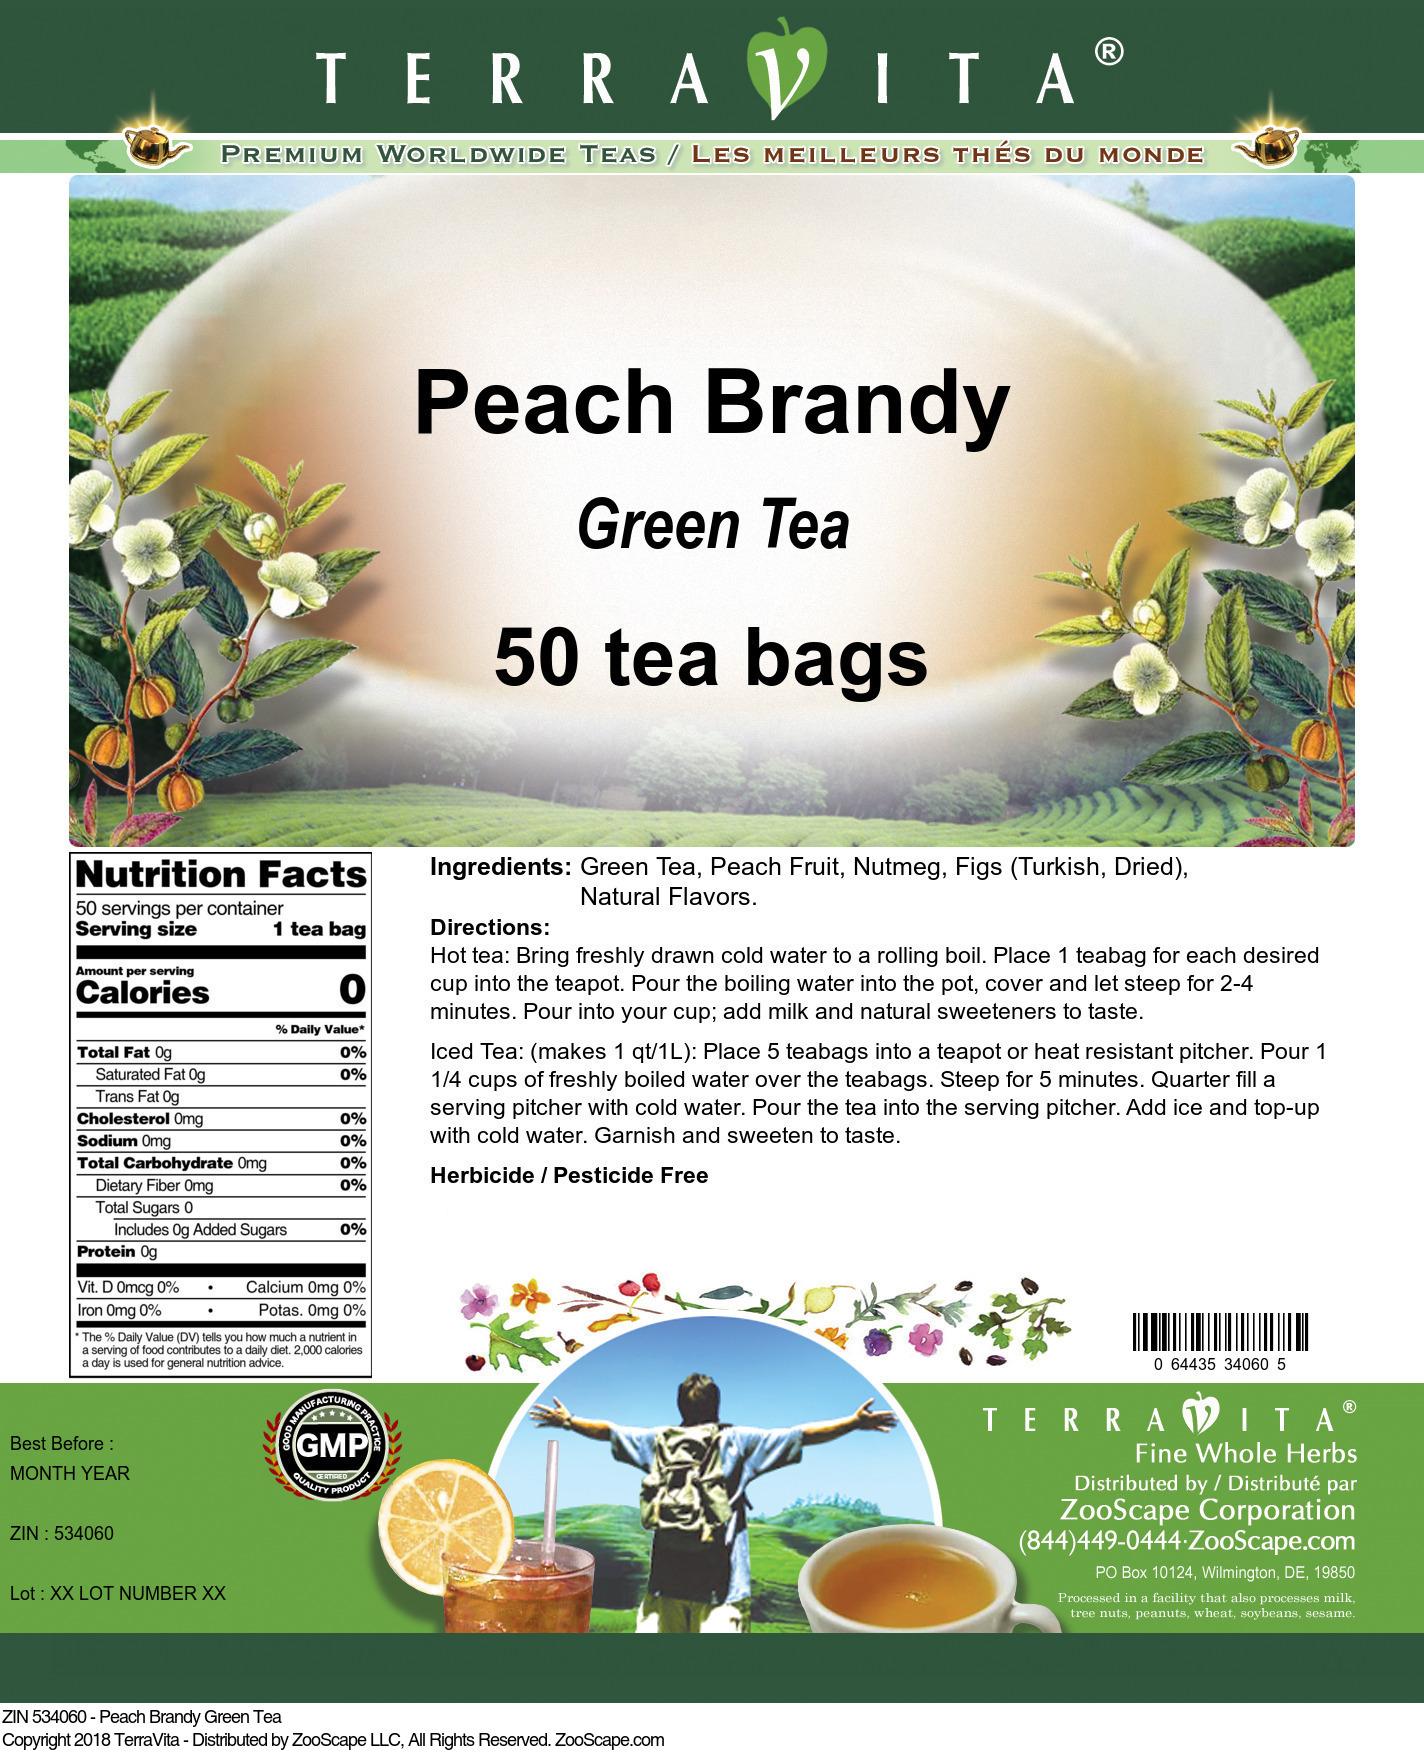 Peach Brandy Green Tea